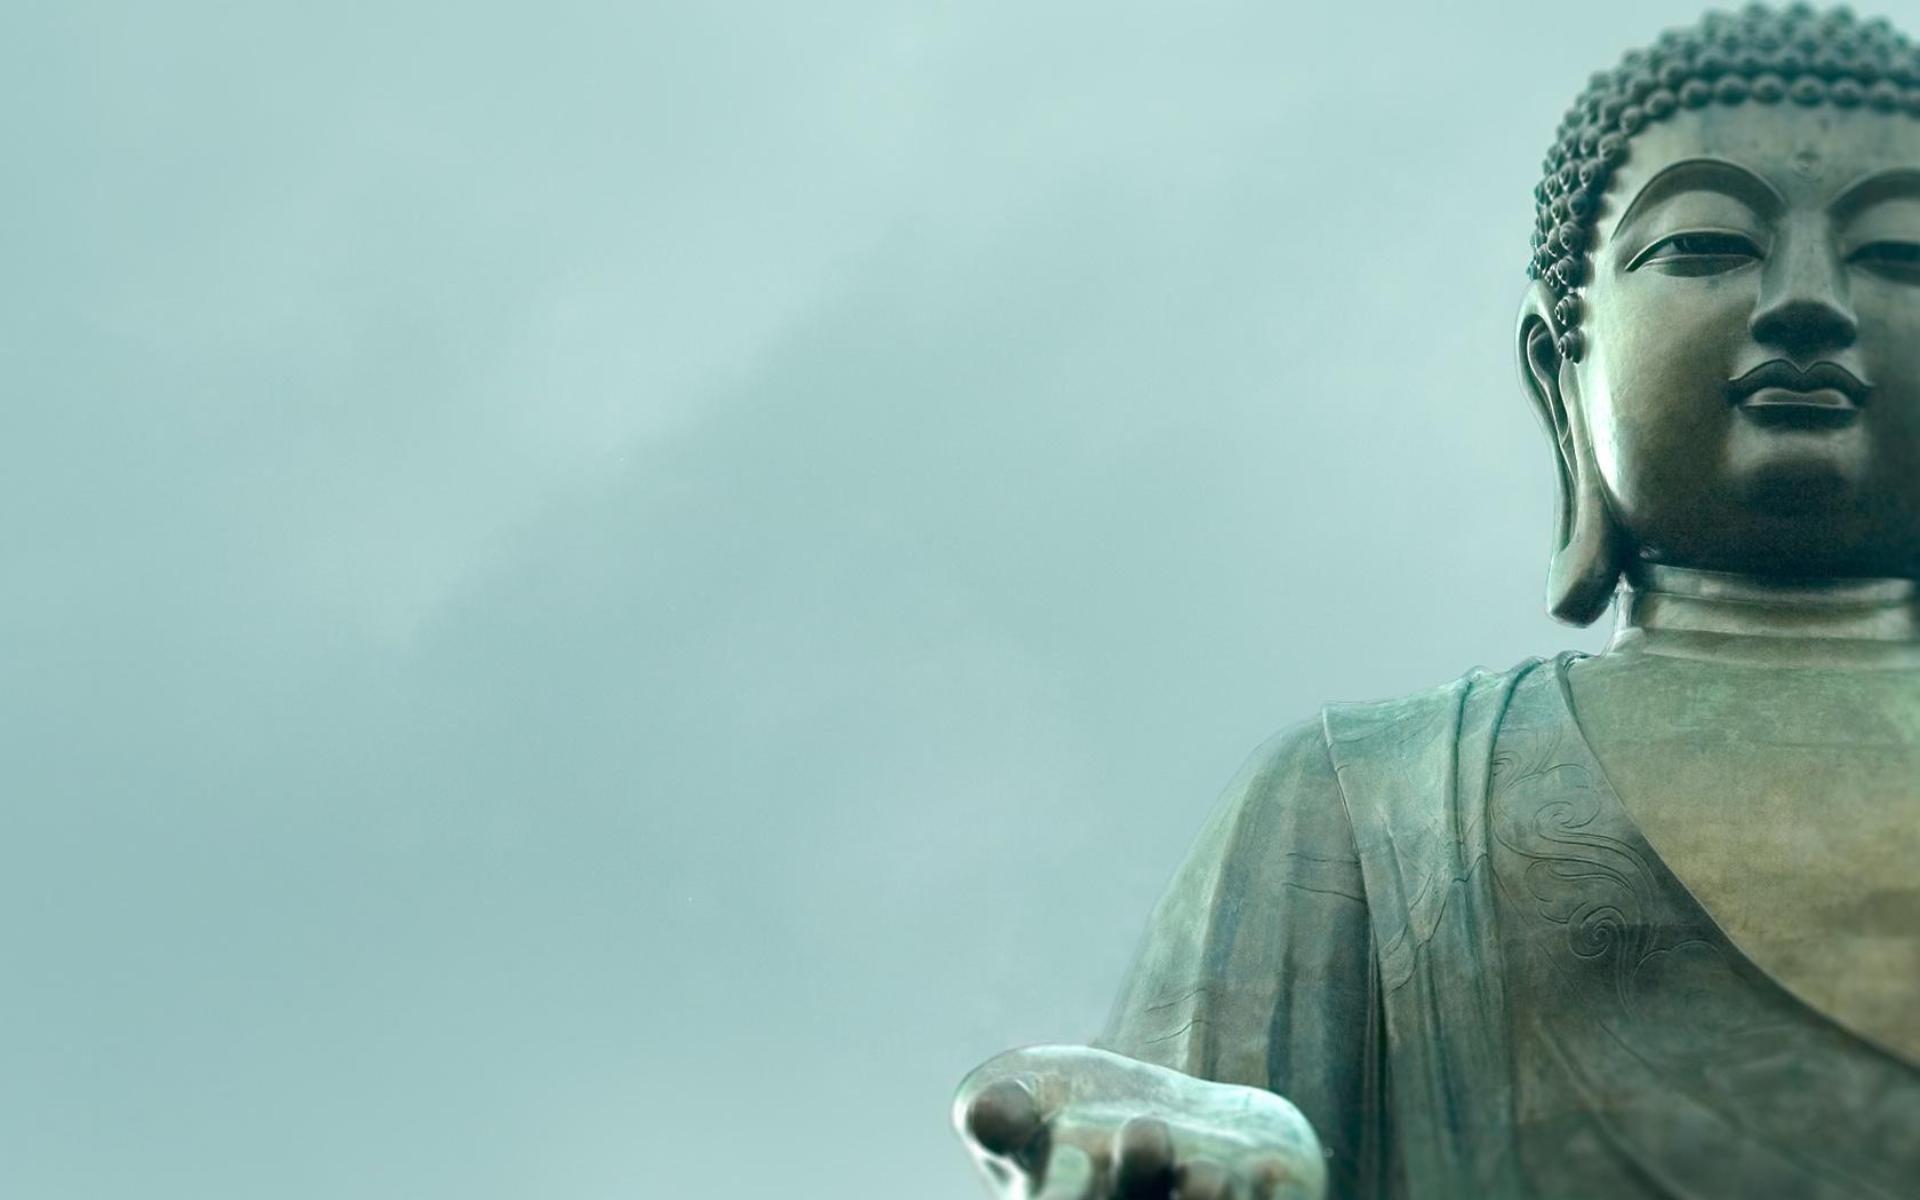 Gautama Buddha Quotes Buddha Quotes On Wisdom  Whitsunday Health And Wellness Retreats